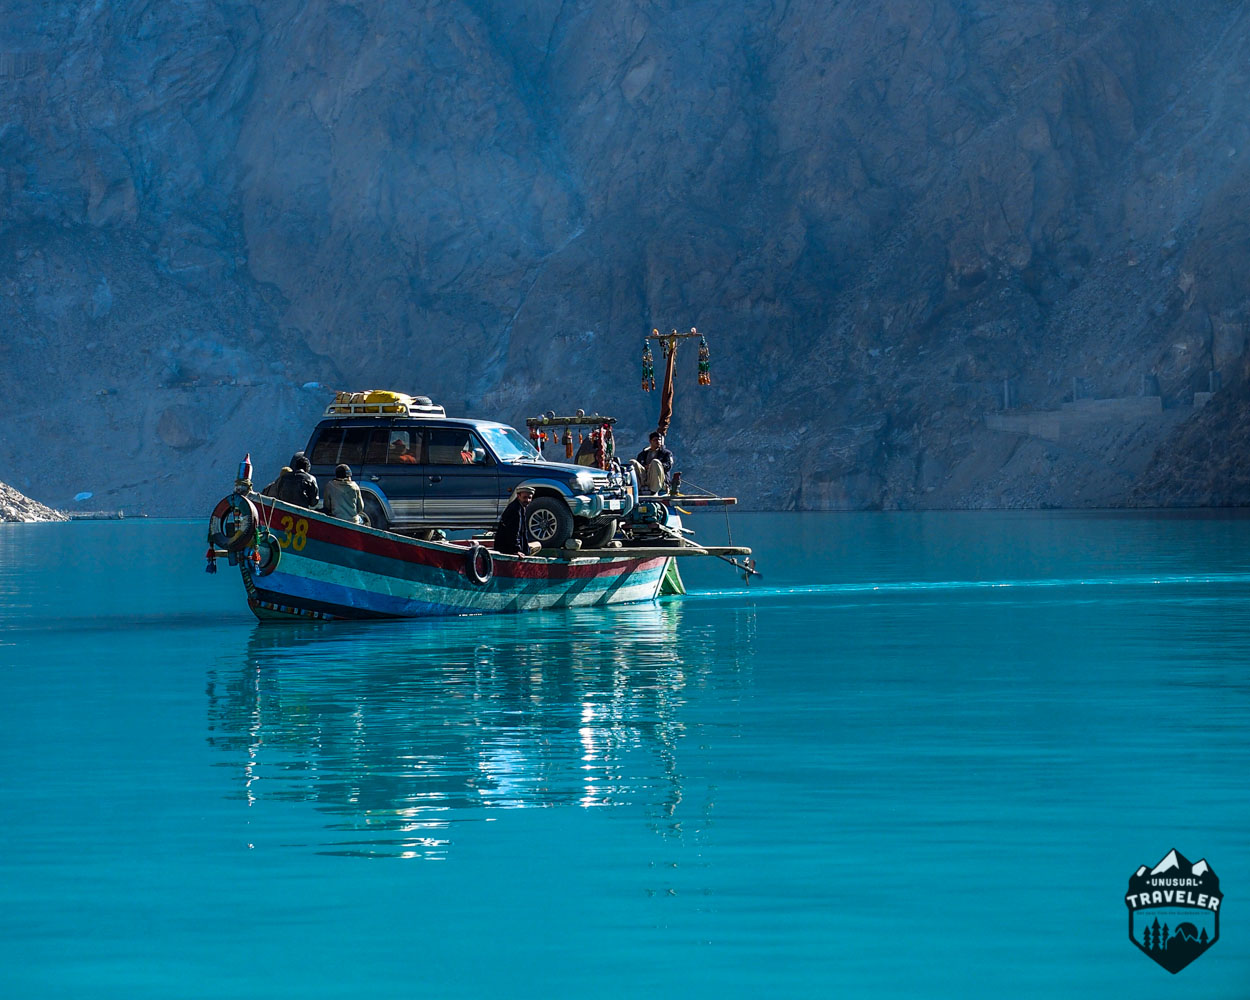 Boat crossing Attabad Lake in Hunza, Pakistan between the Karakoram range